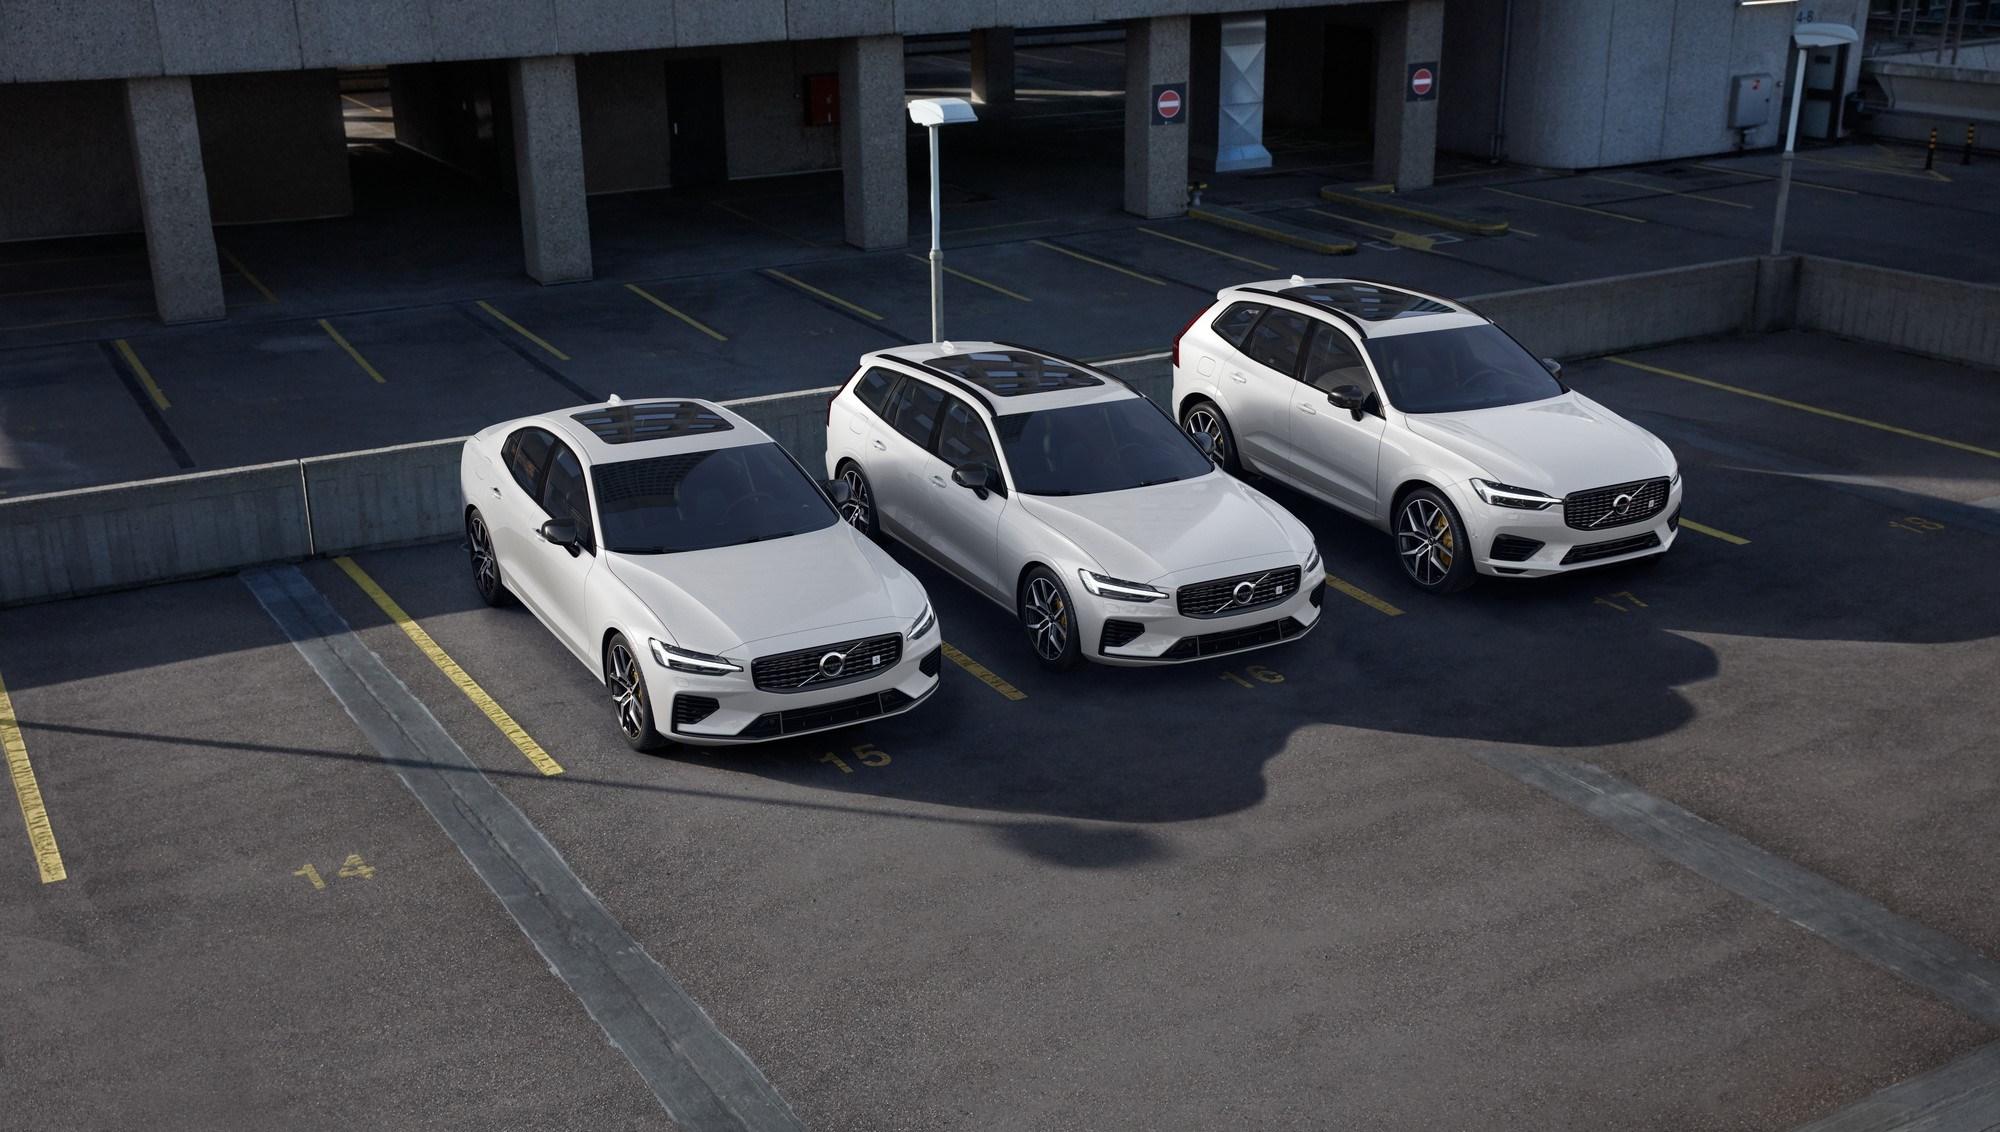 2020 Volvo Xc60 T8 2020 V60 T8 Plug In Hybrids Get Polestar